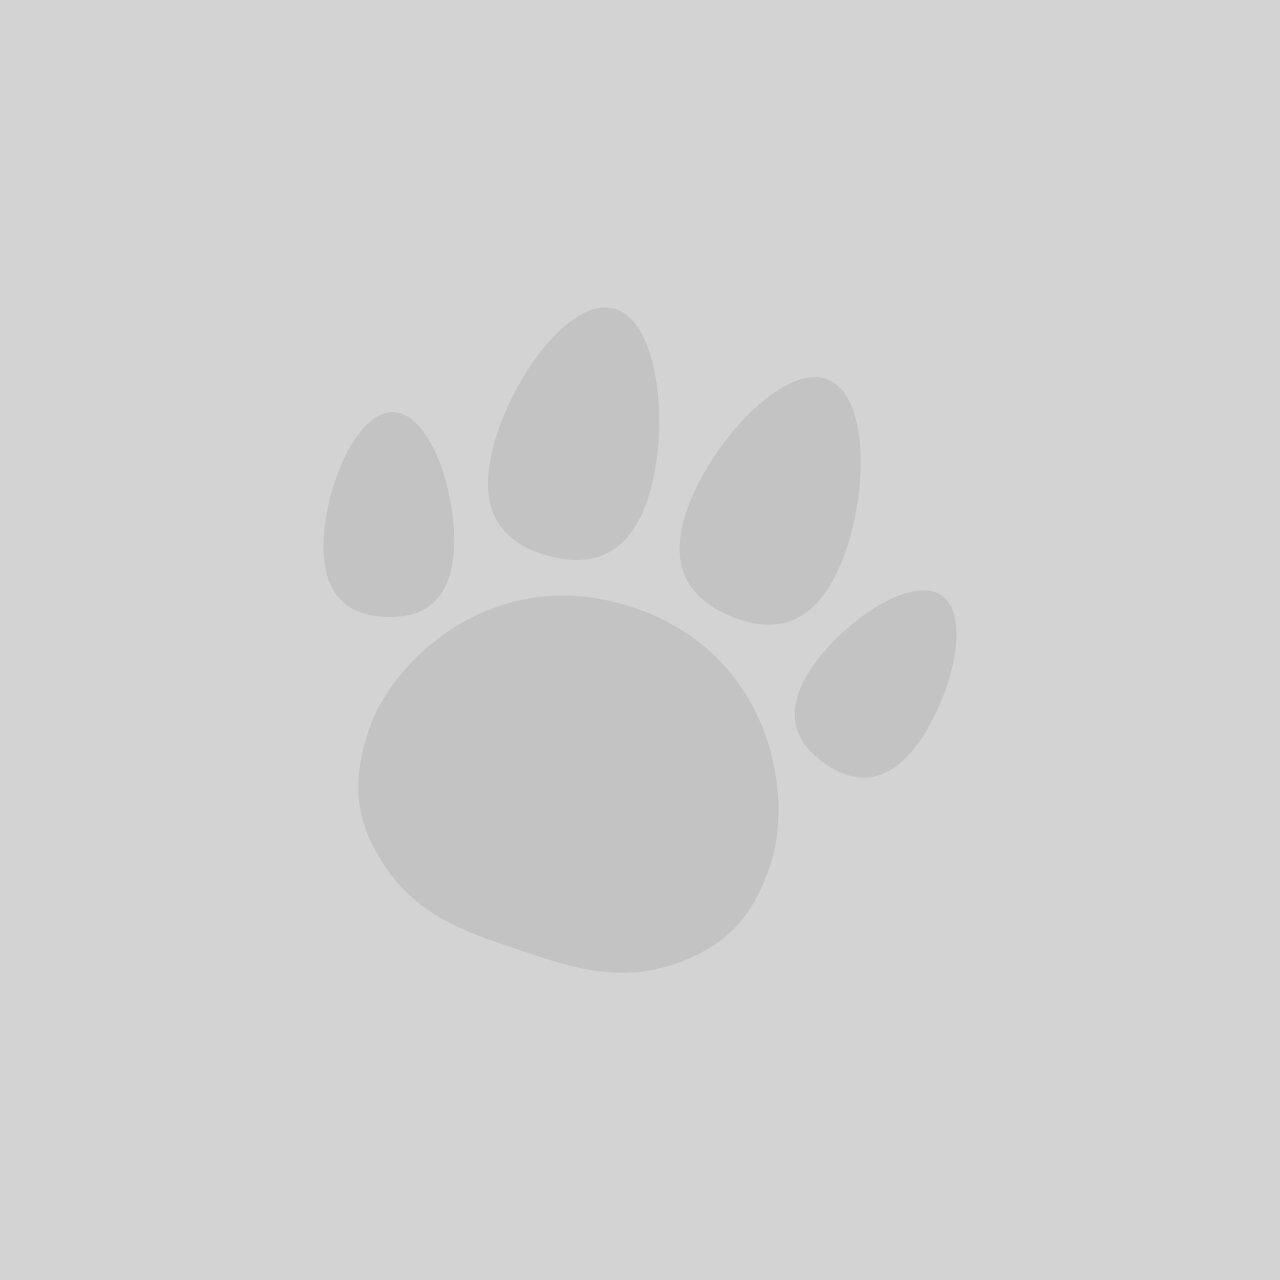 Whiskas Trio Crunchy Cat Treats Poultry Flavours 55g